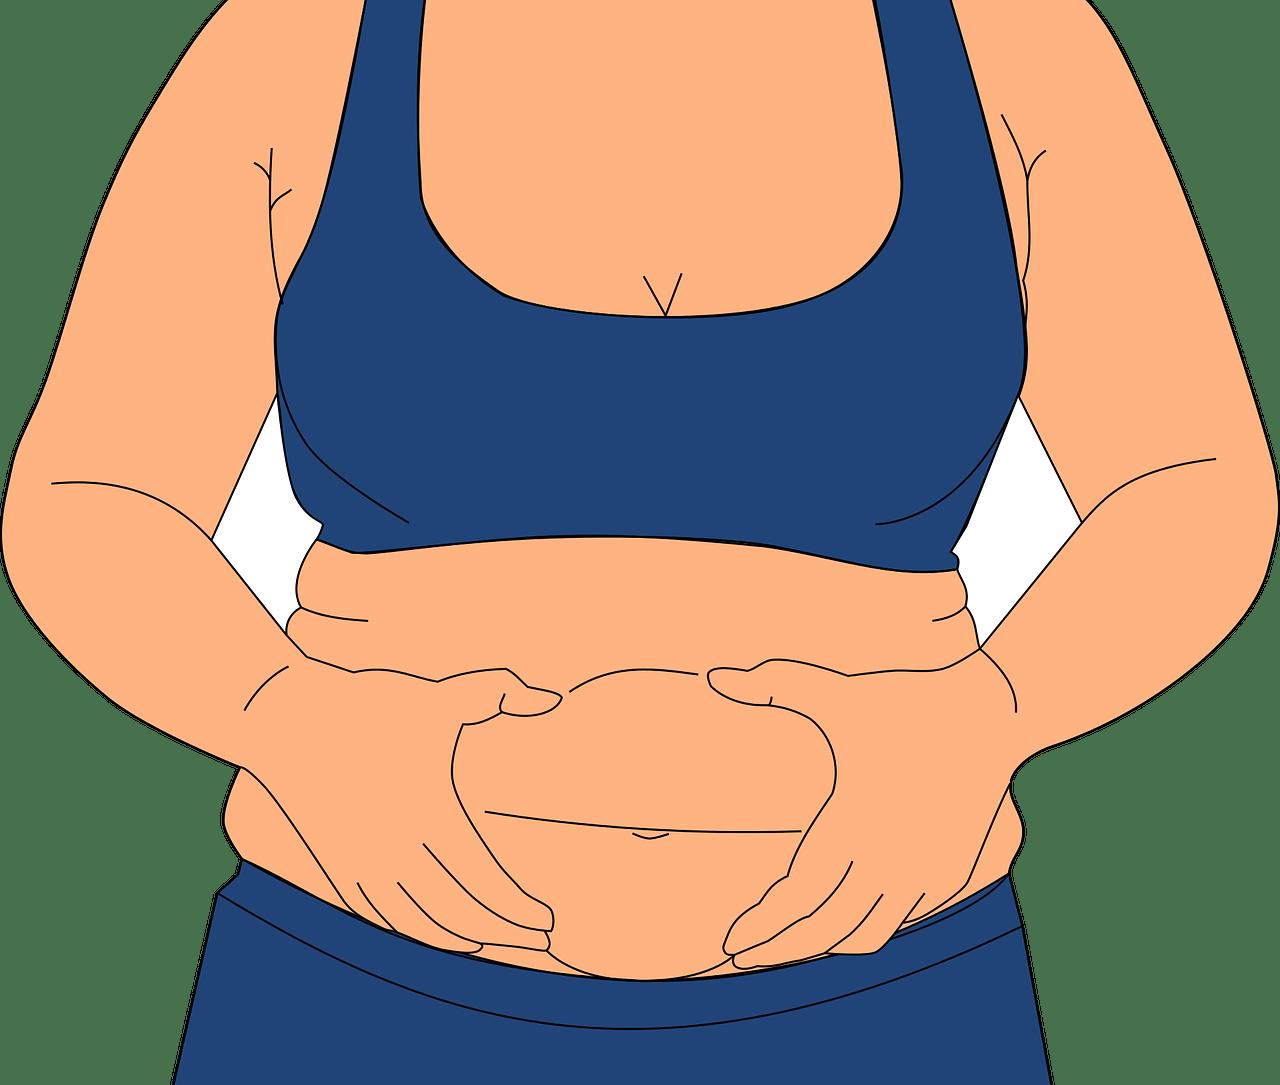 obesity, fatness, love handles